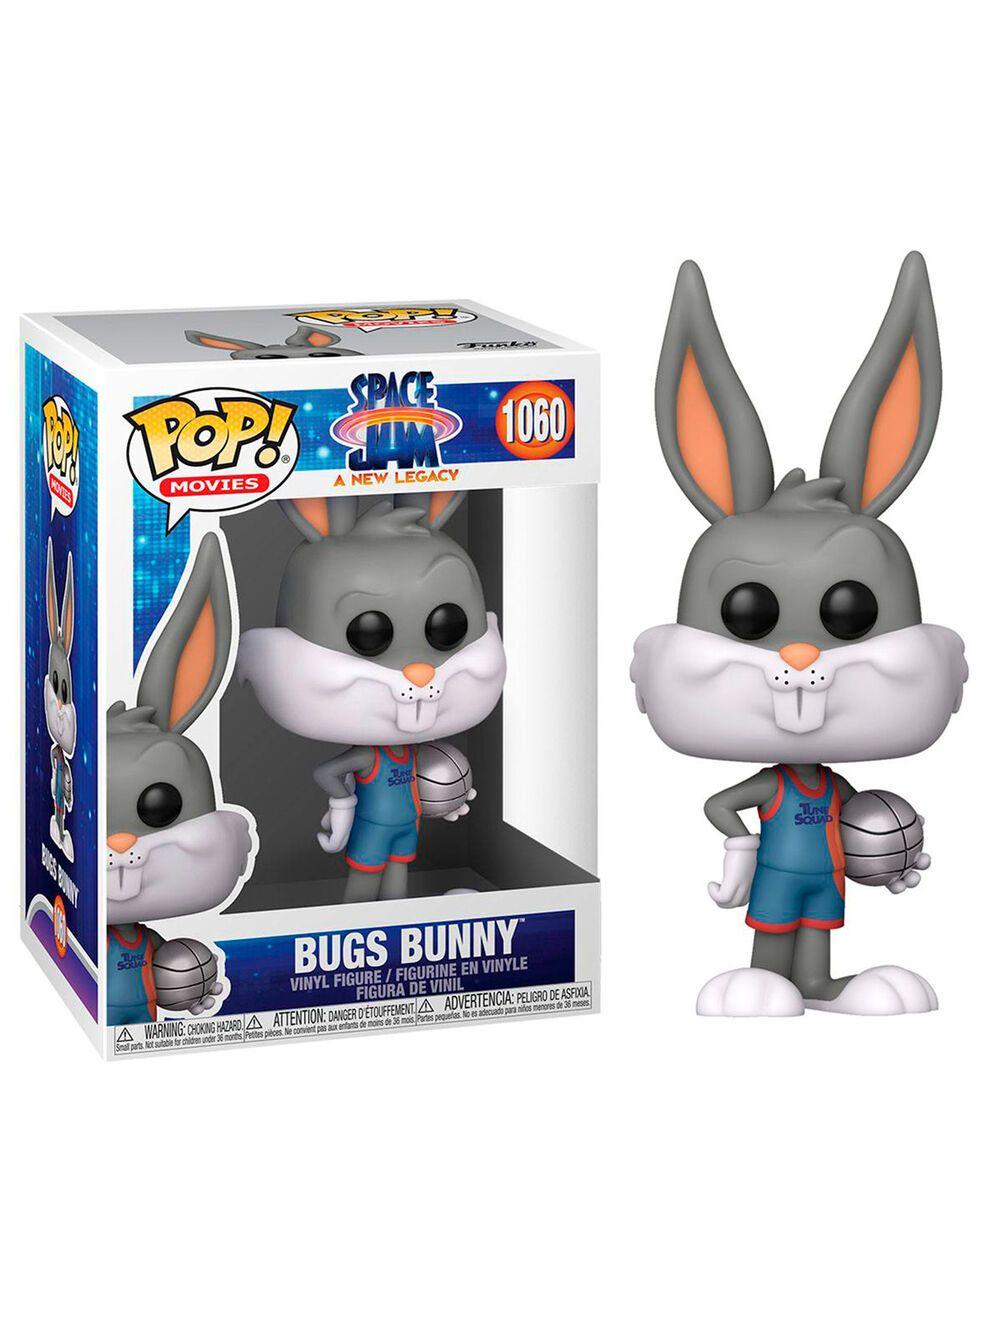 Funko POP! Space Jam 2 - Bugs Bunny